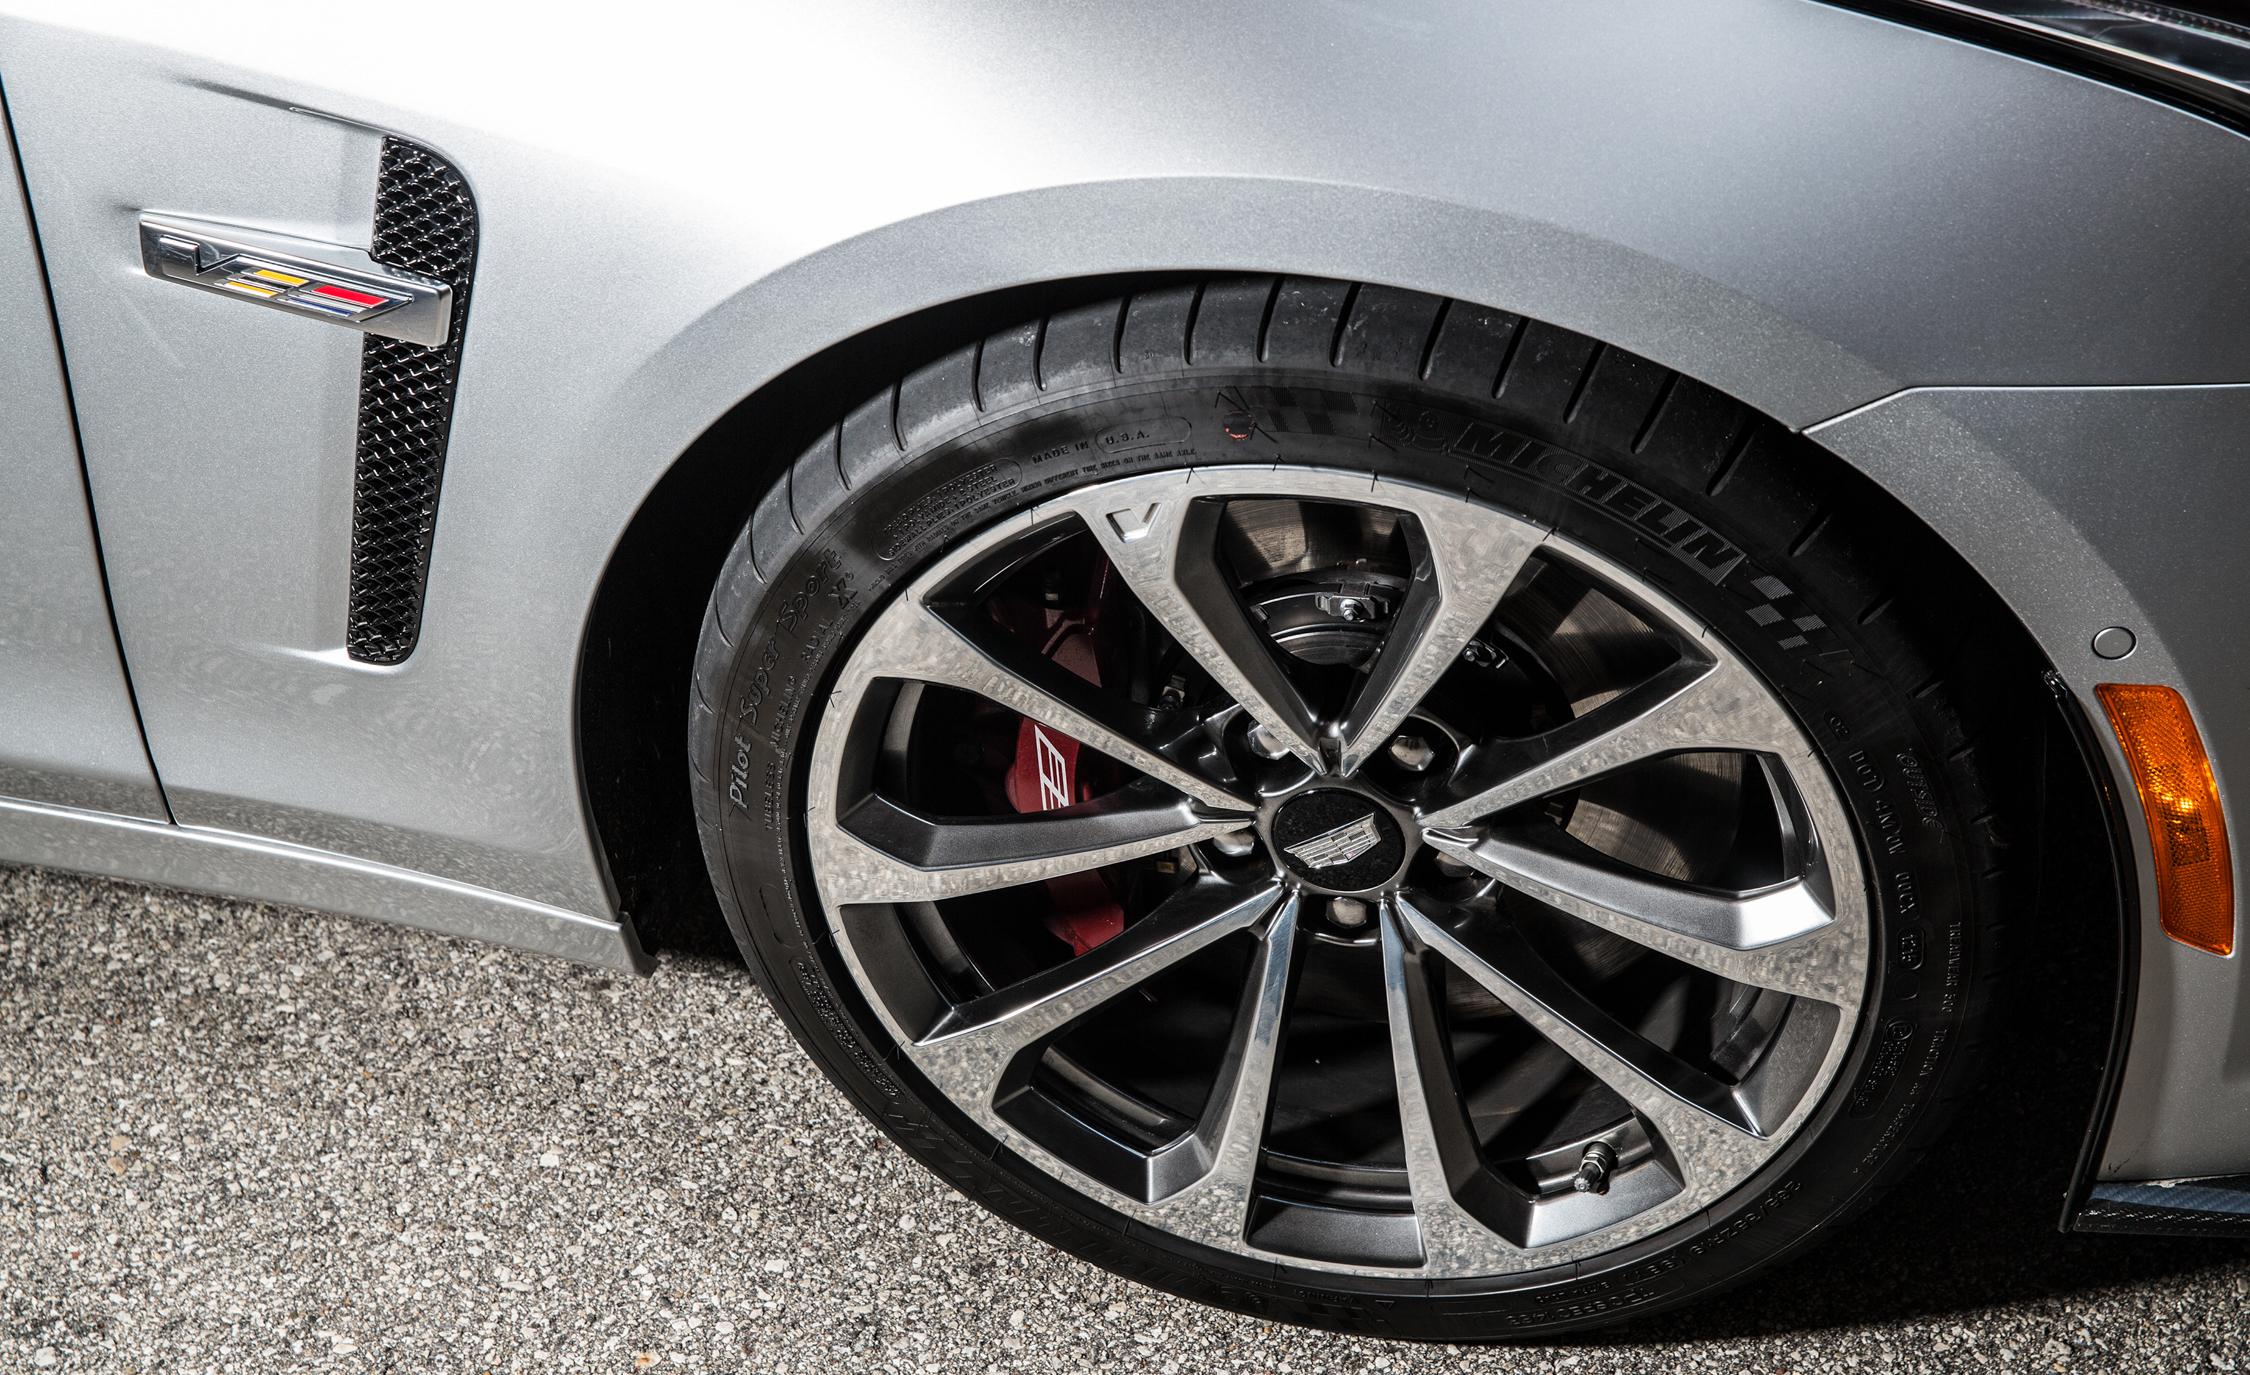 2016 Cadillac CTS-V Exterior Wheel